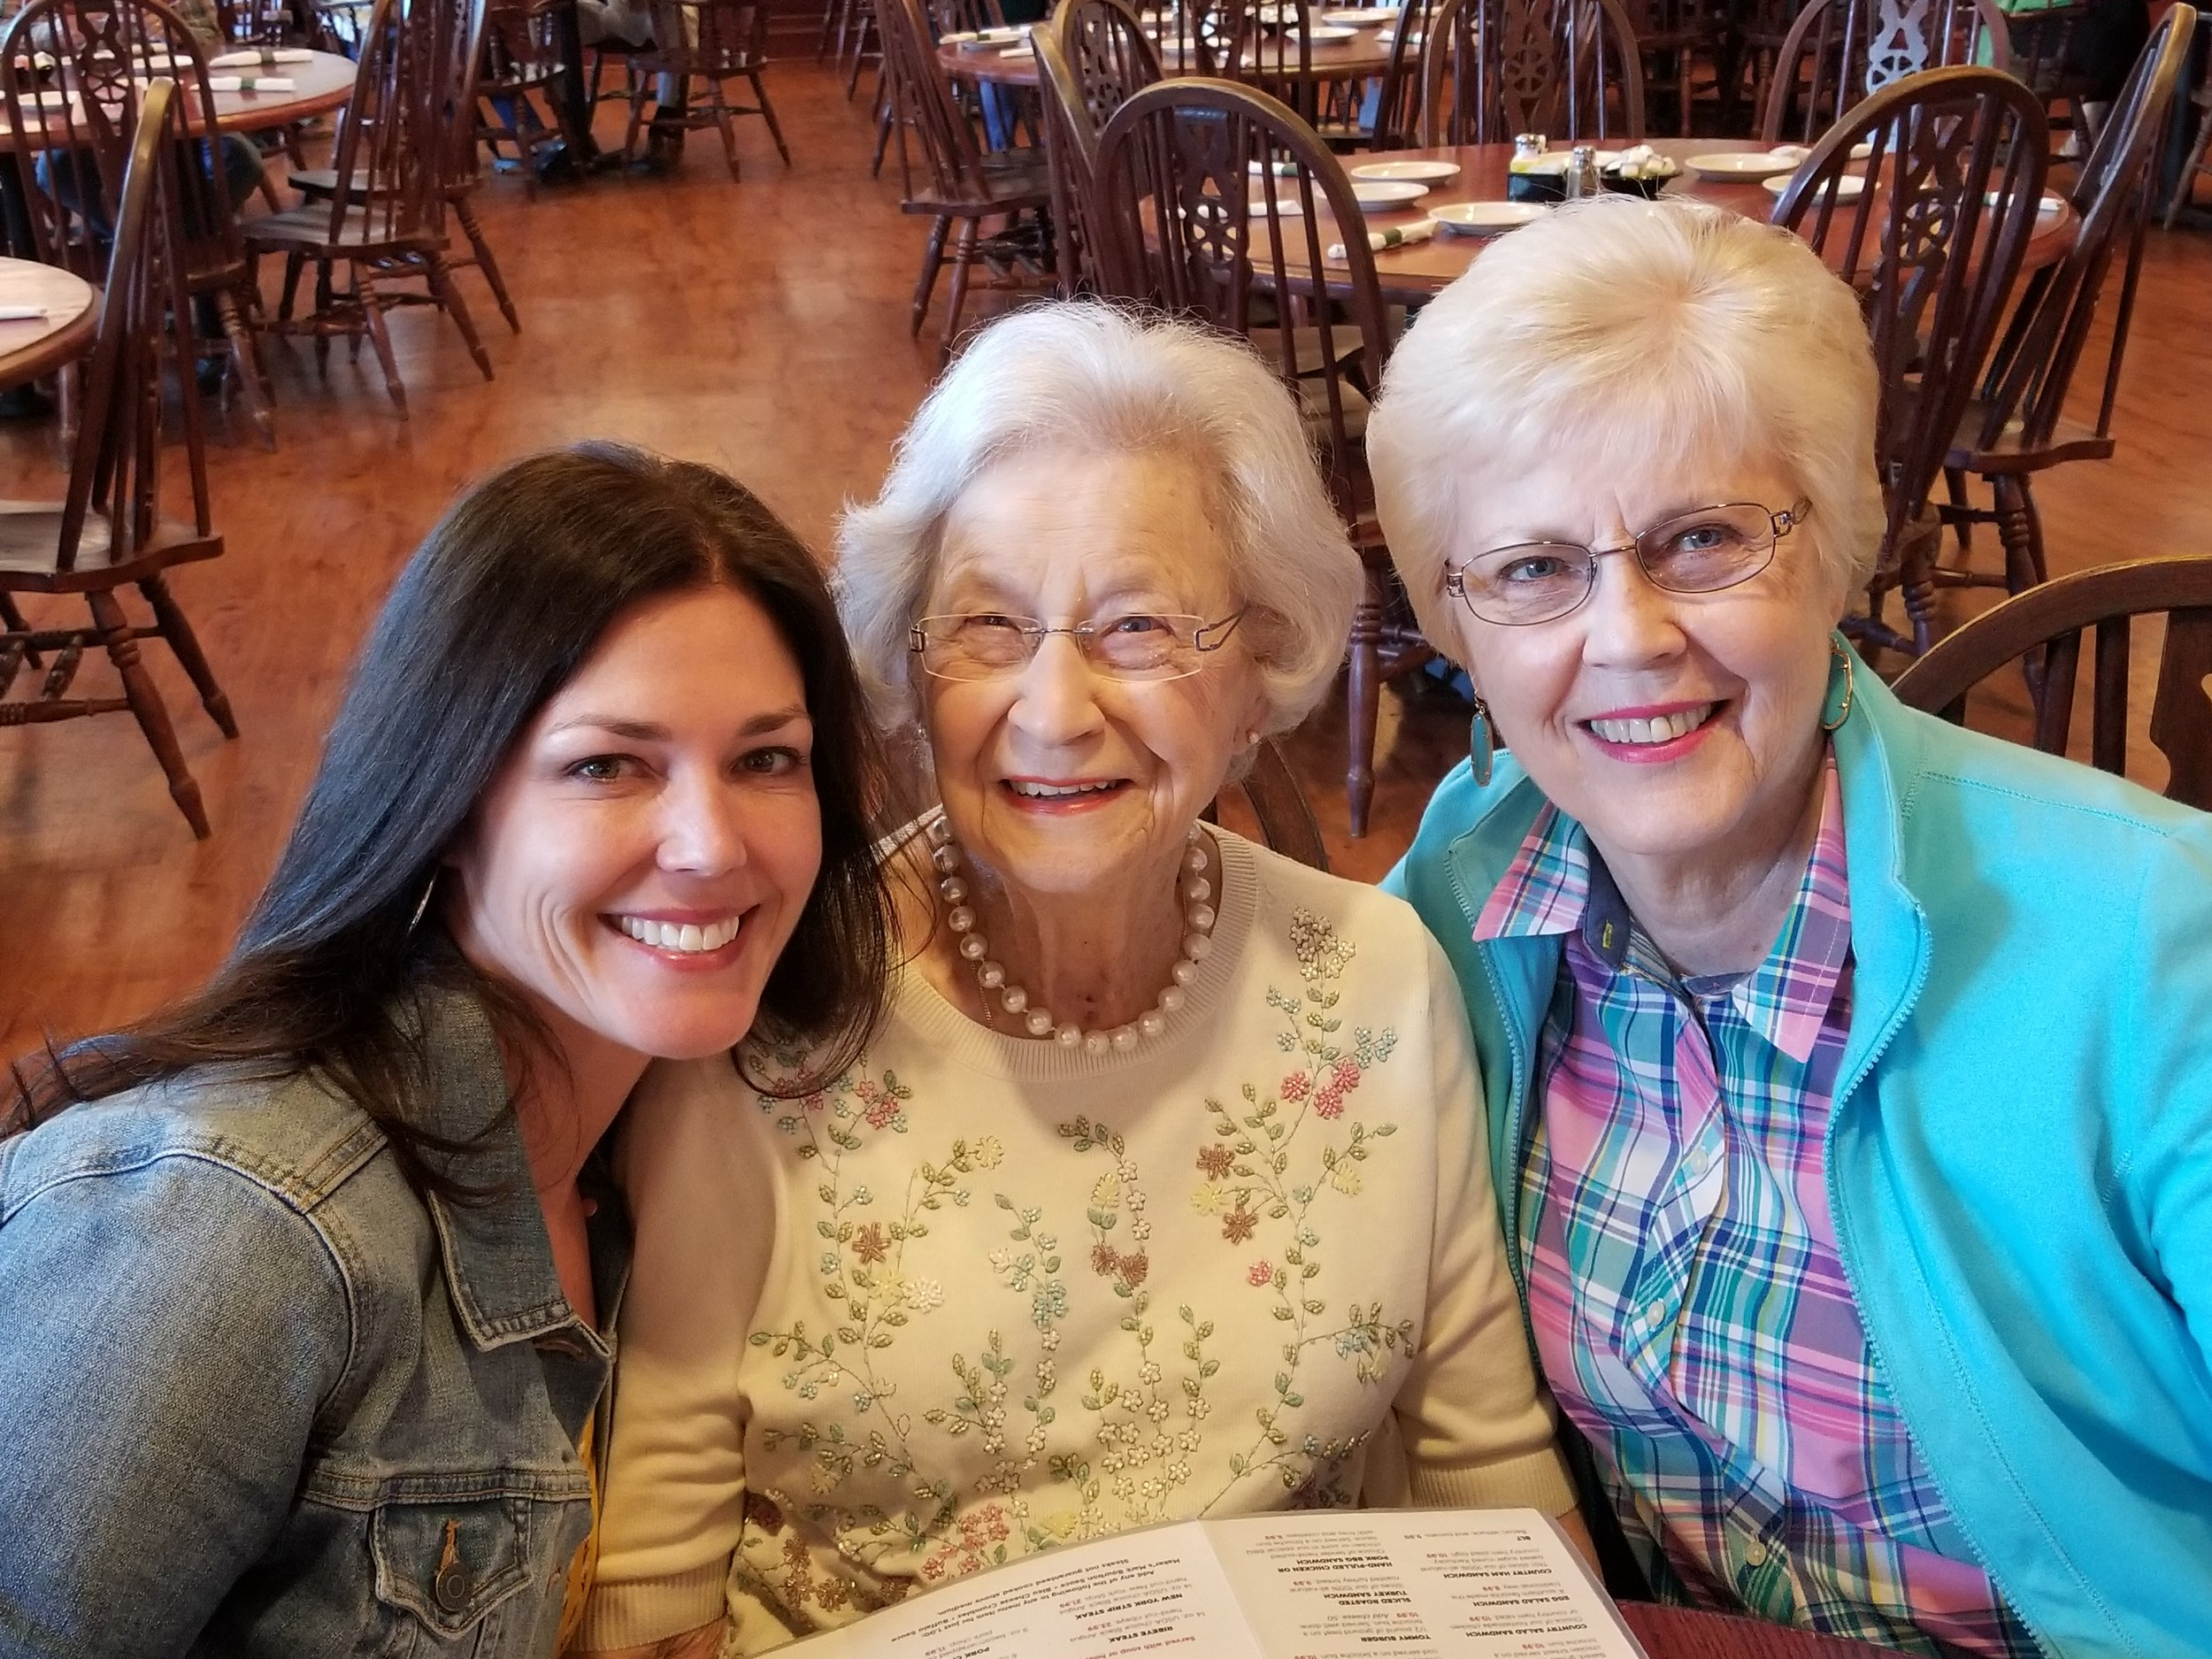 Amanda, 95 year old grandmother and mom